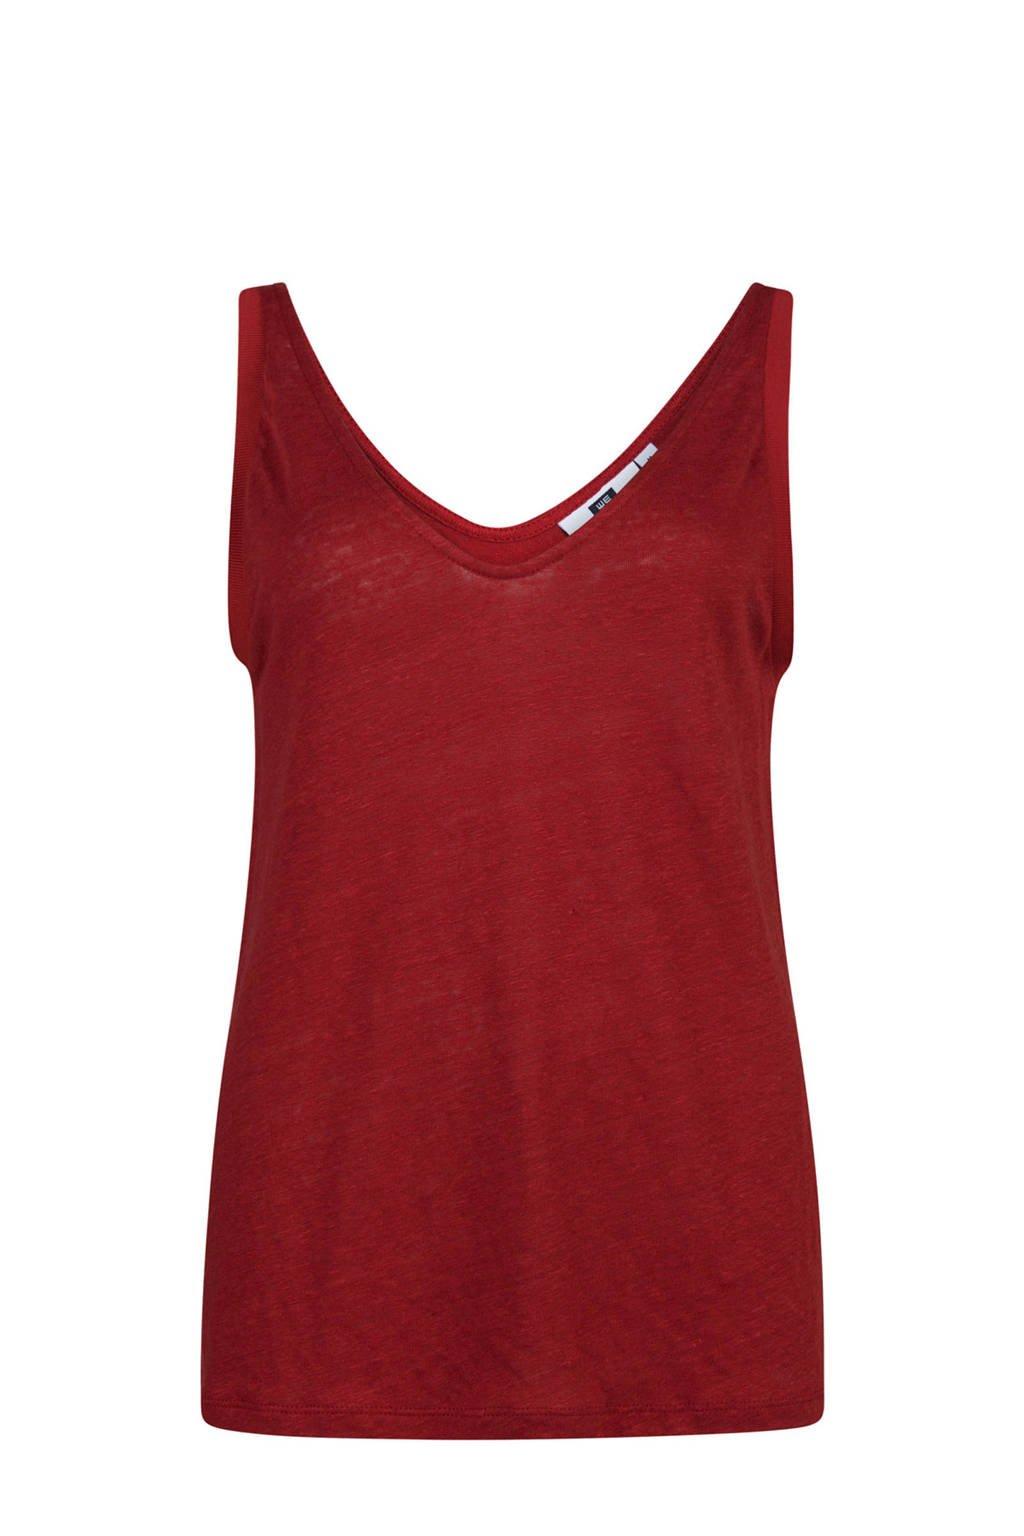 WE Fashion linnen singlet, Stone Red